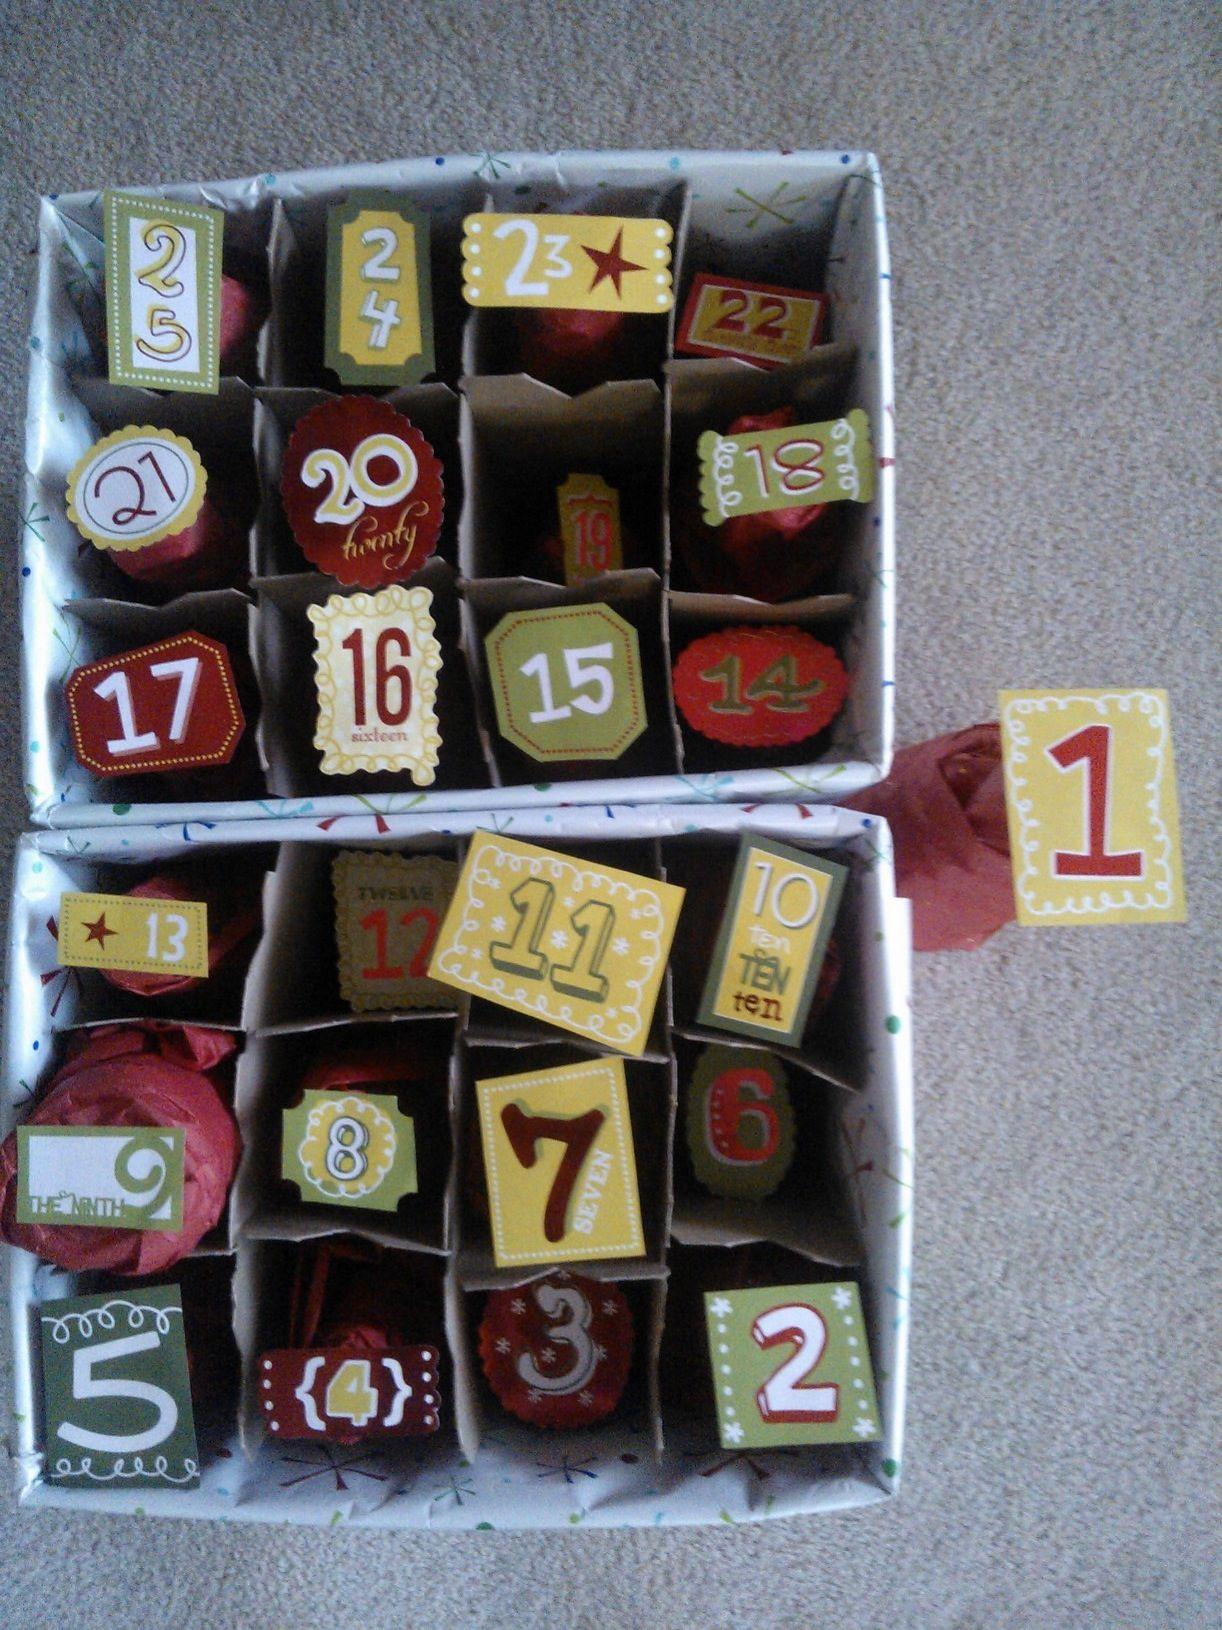 My Beer Advent Calendar Great Advent Calendar Option For Adults